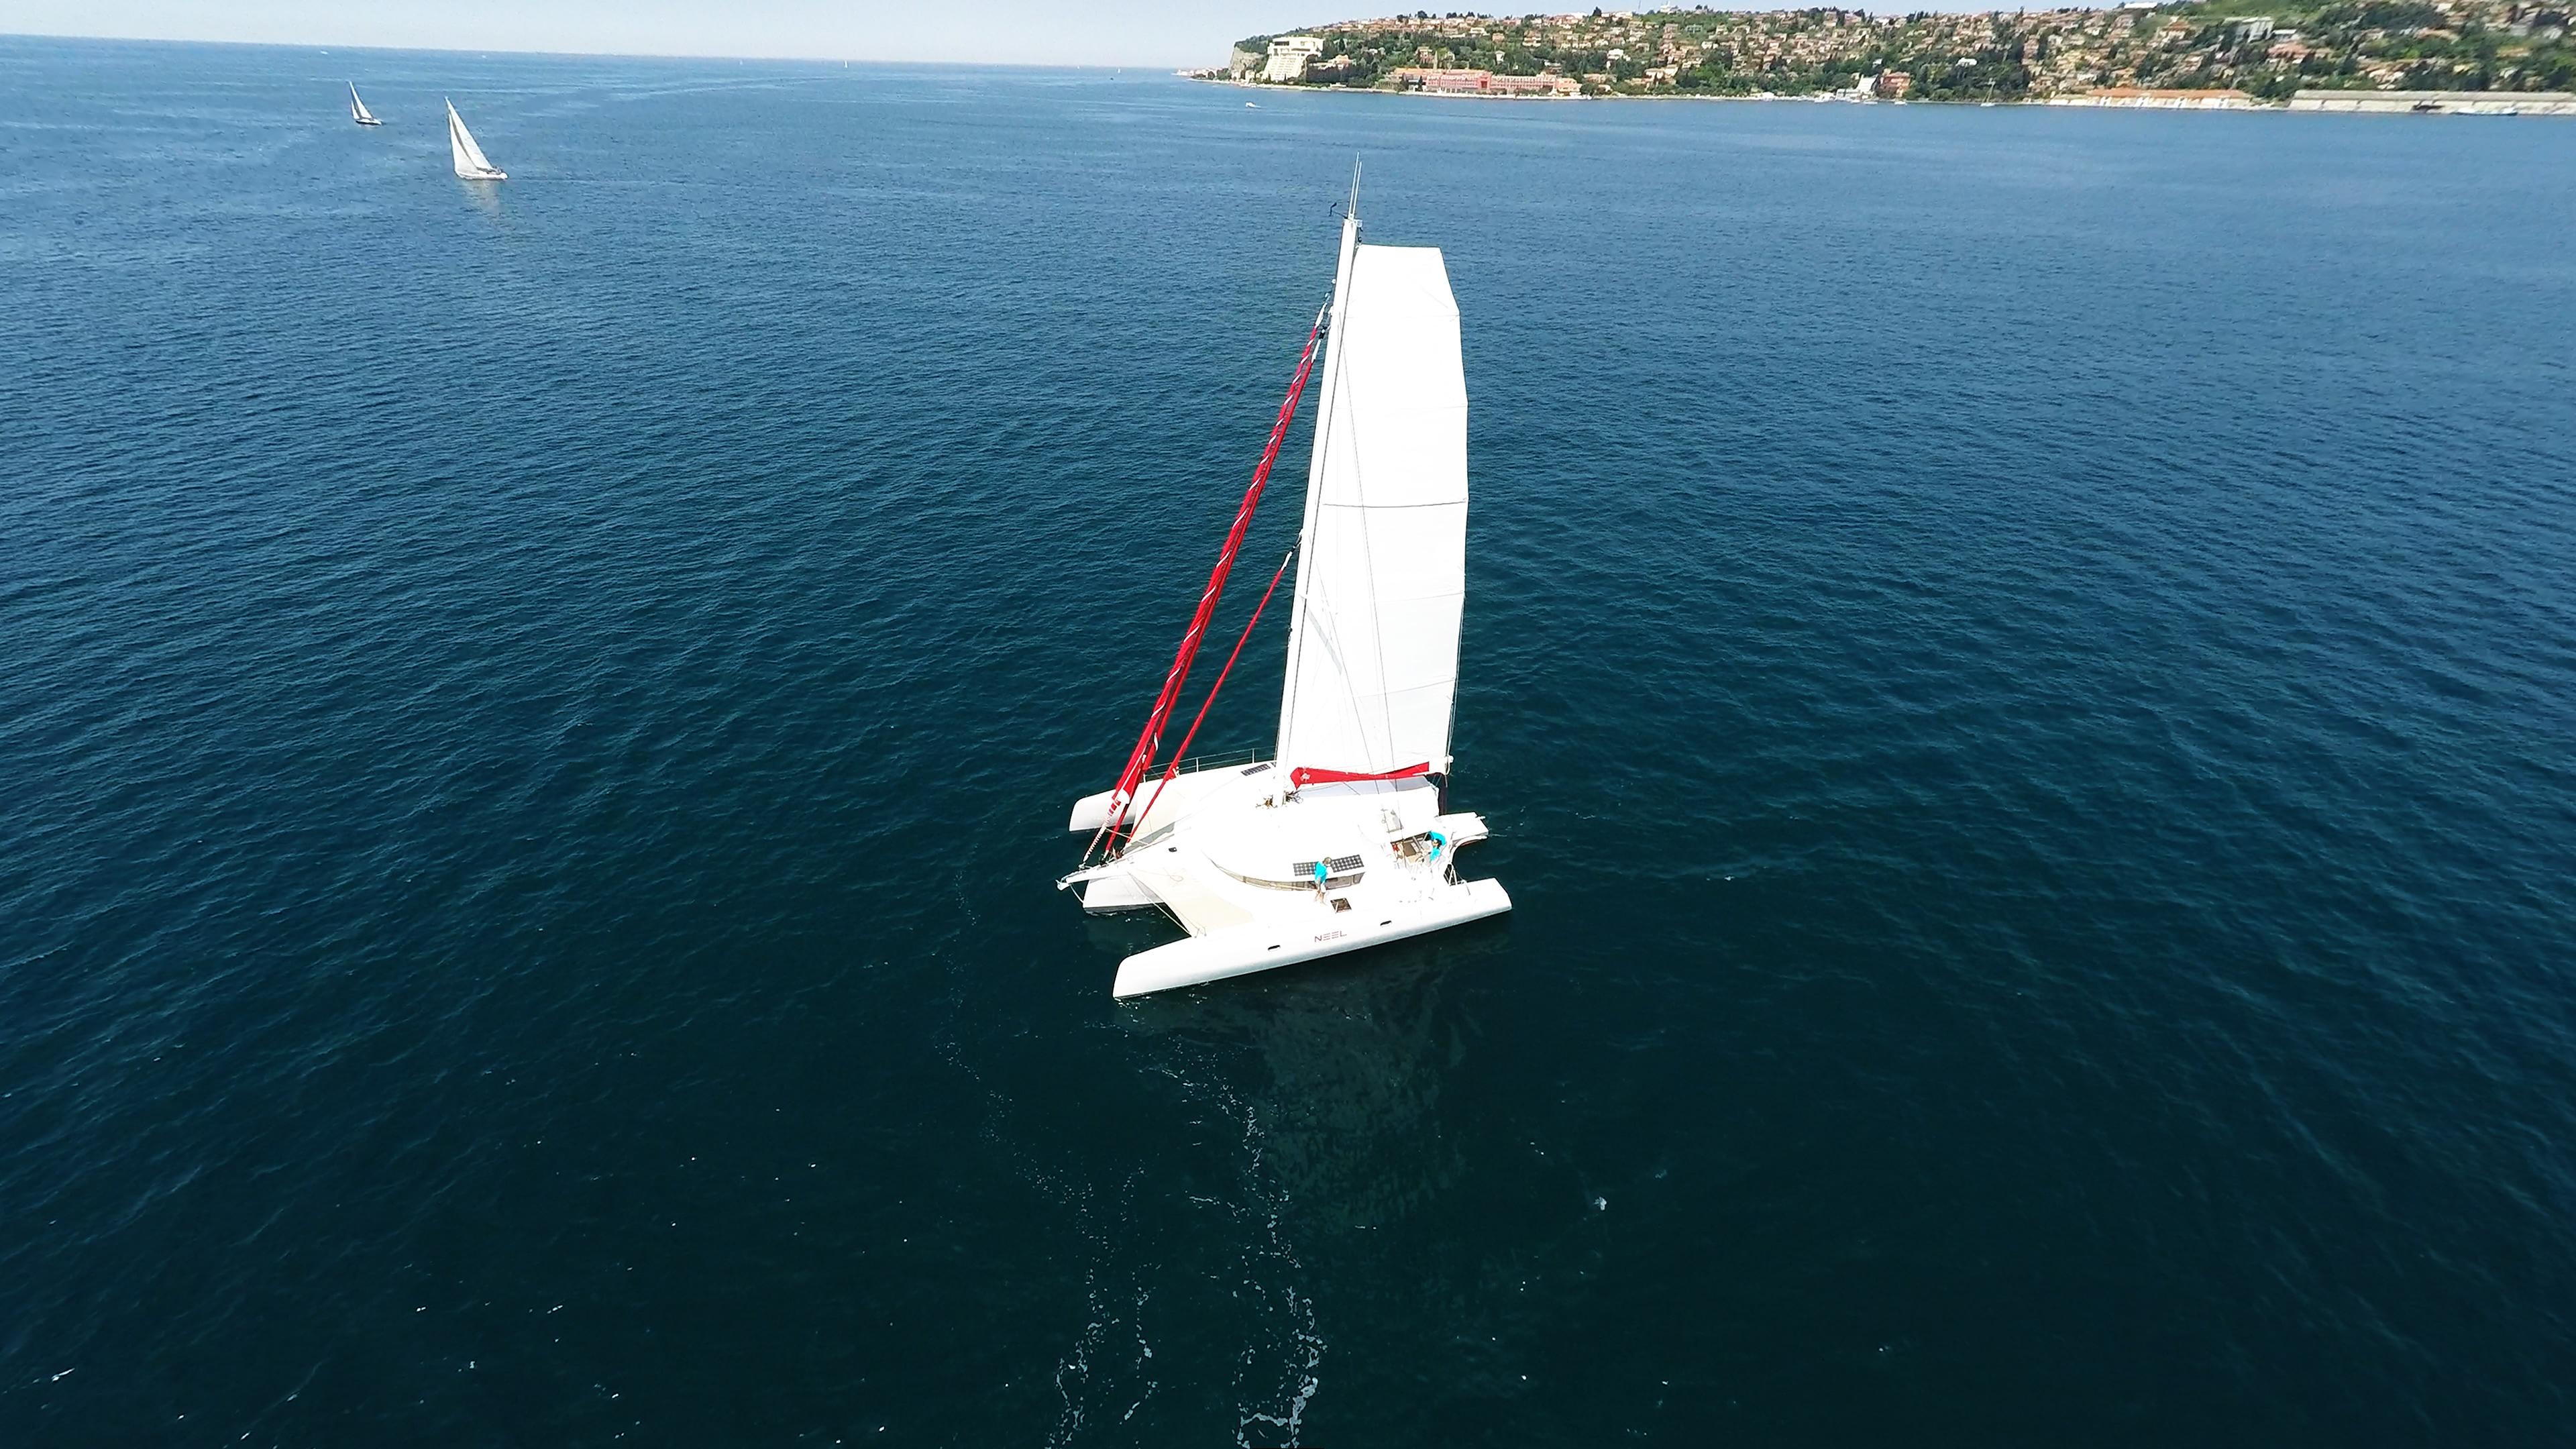 bianco trimarano yacht naviga a vela al blu mare